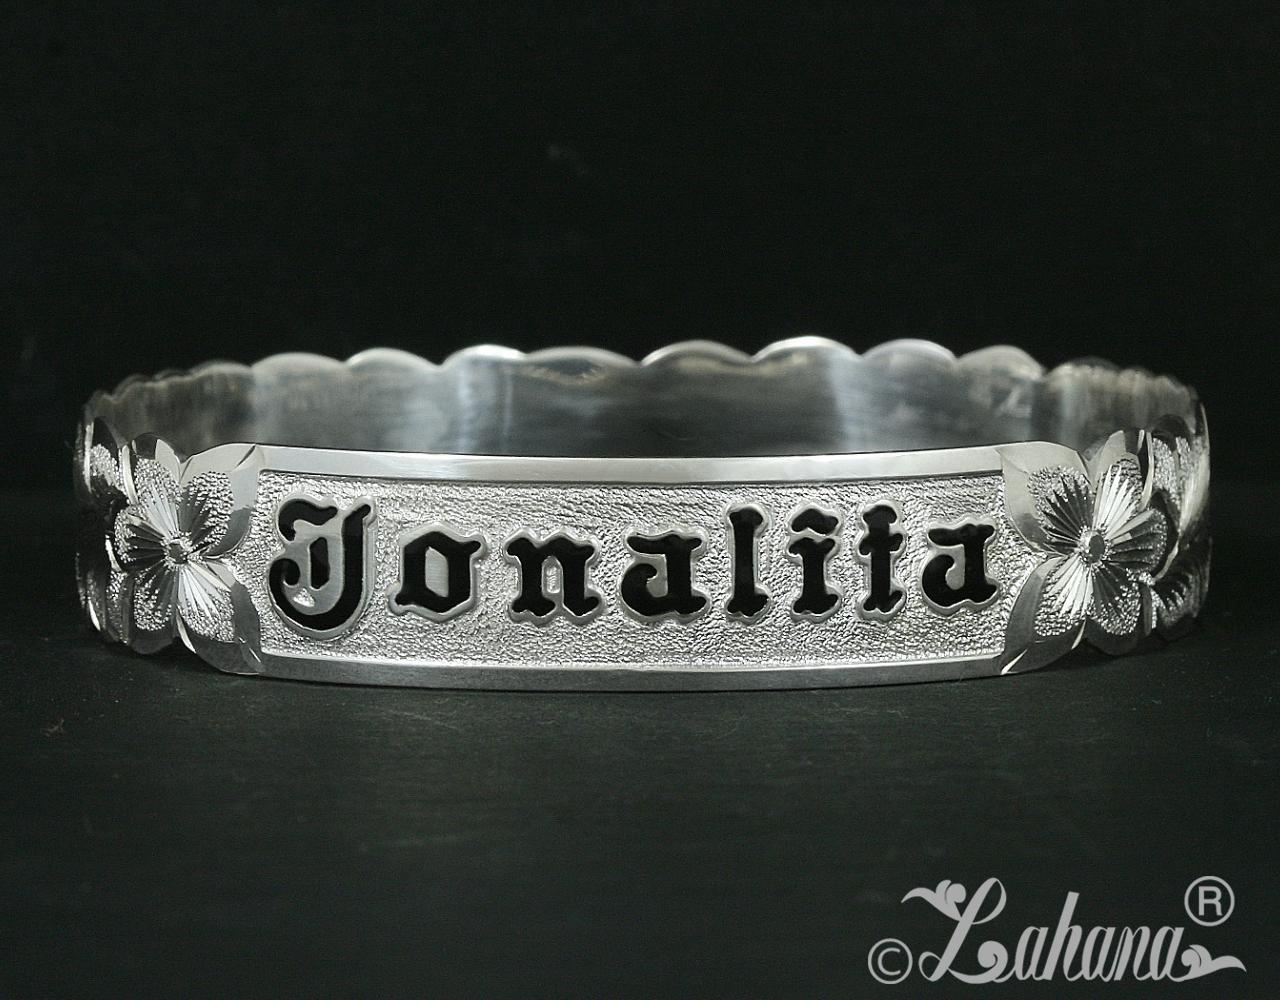 ad-b-jonalita-queen-maile-wm1.jpg